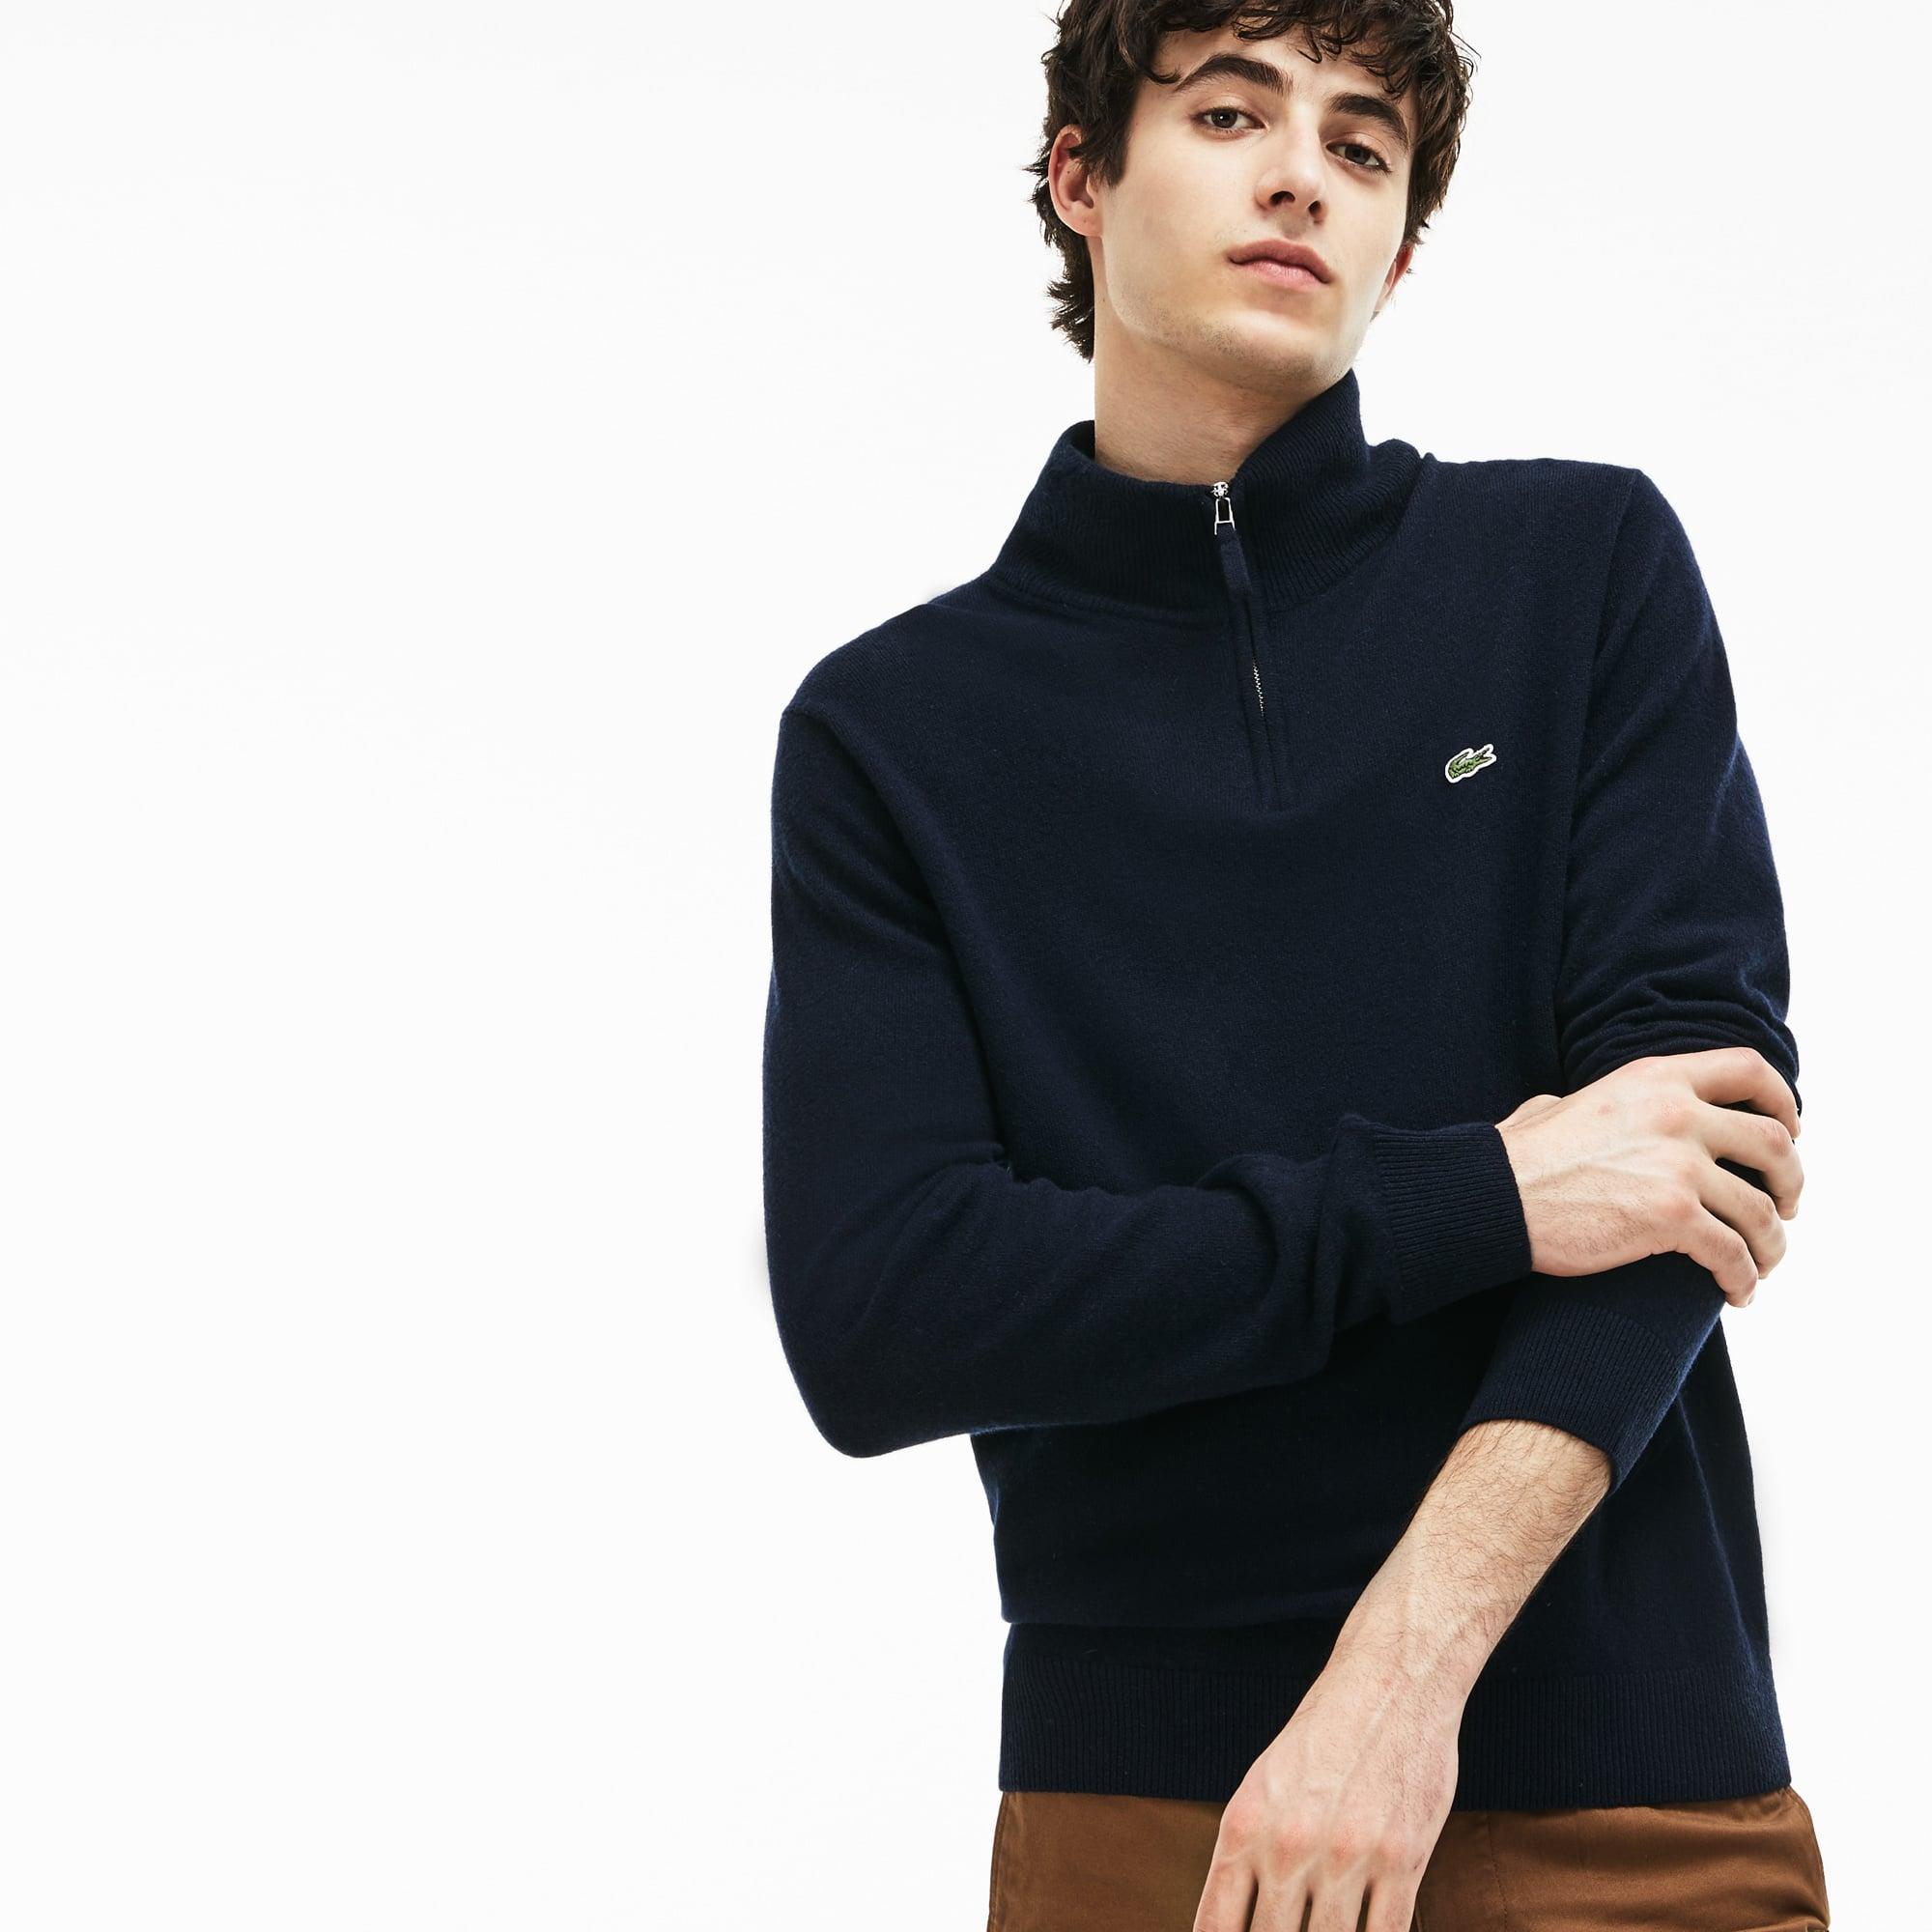 Men's Zippered Stand-Up Collar Merino Wool Jersey Sweater